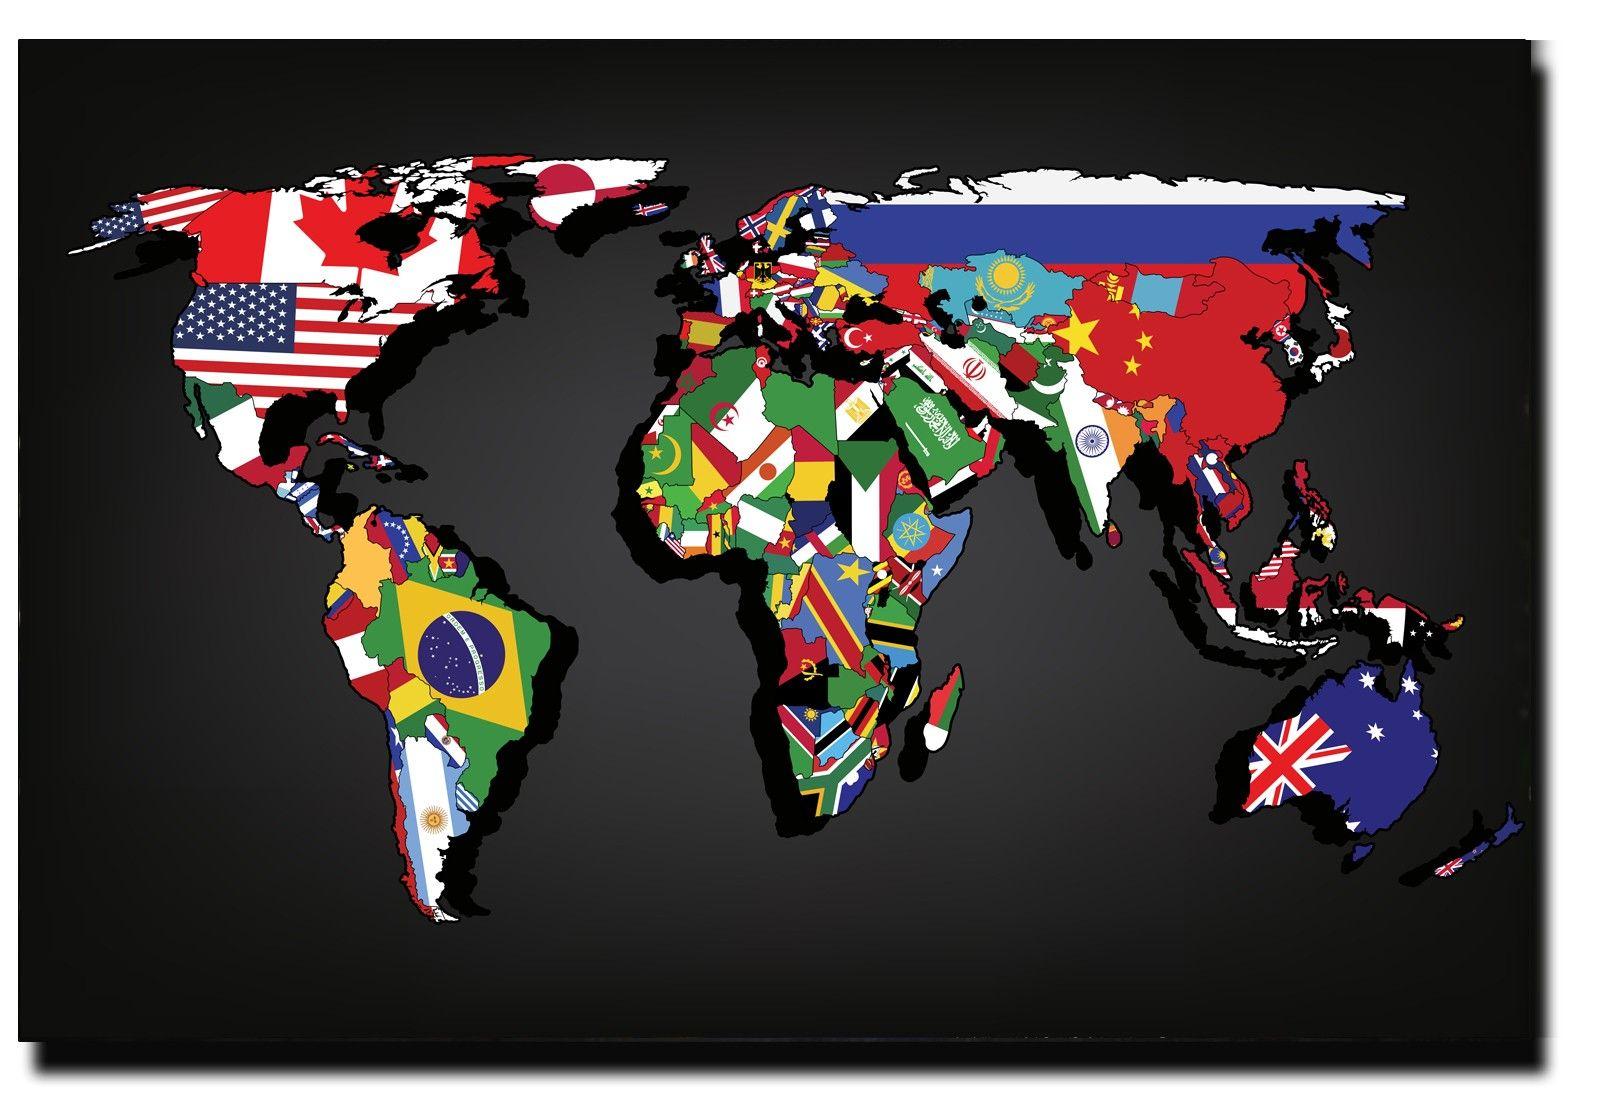 Map flag interrail pinterest flags world map flags by strejman via shutterstock gumiabroncs Images